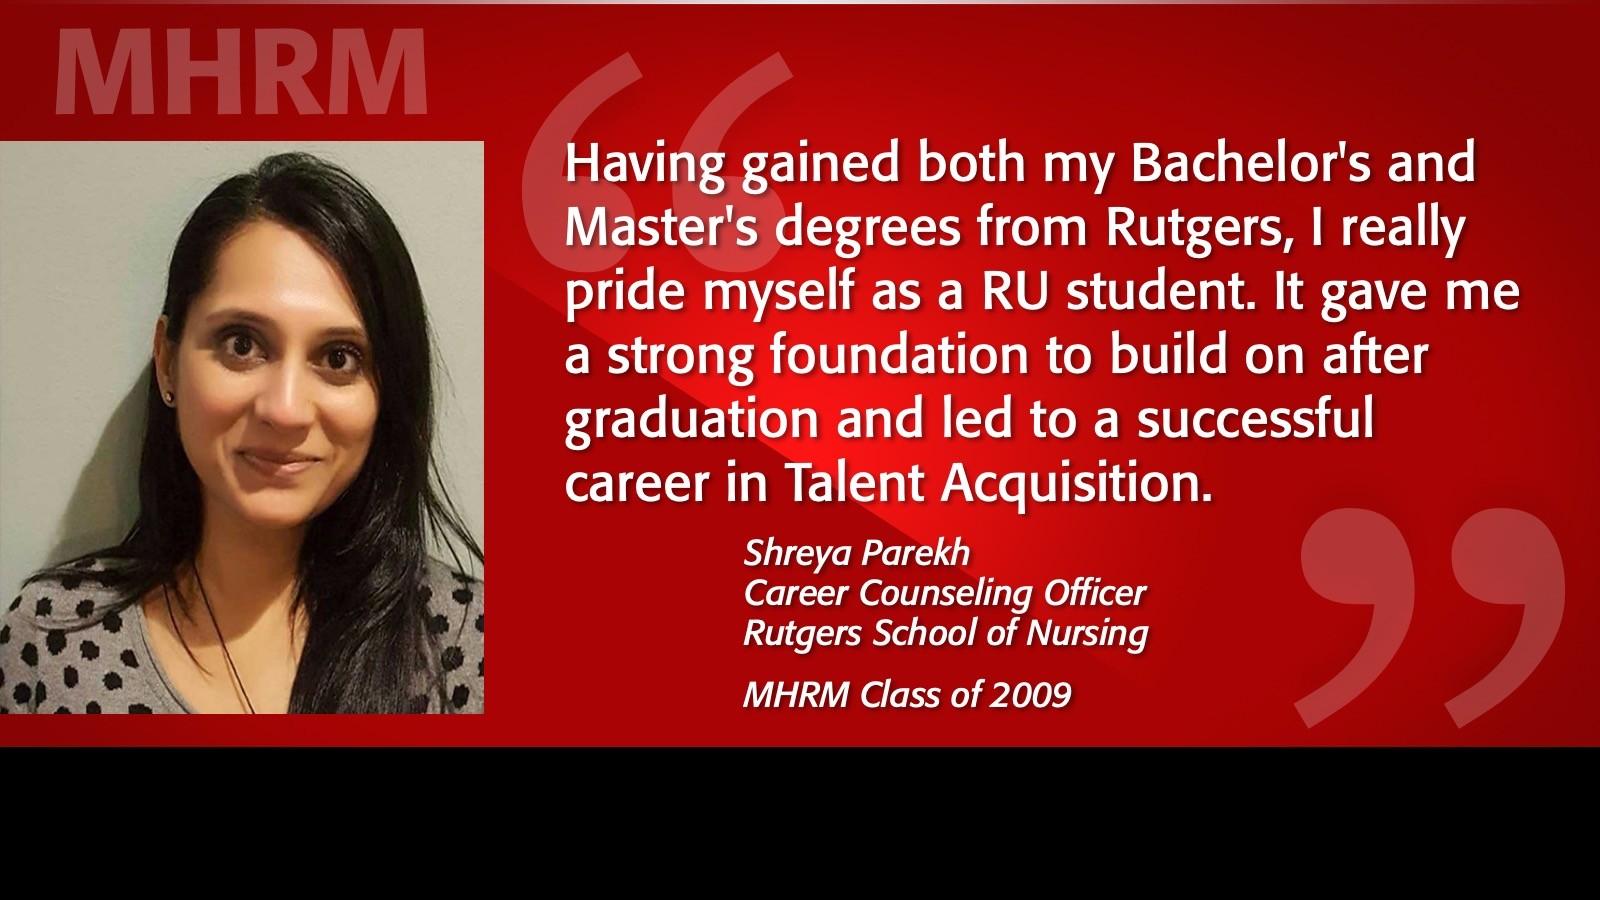 Image of Shreya Parekh MHRM Testimonial